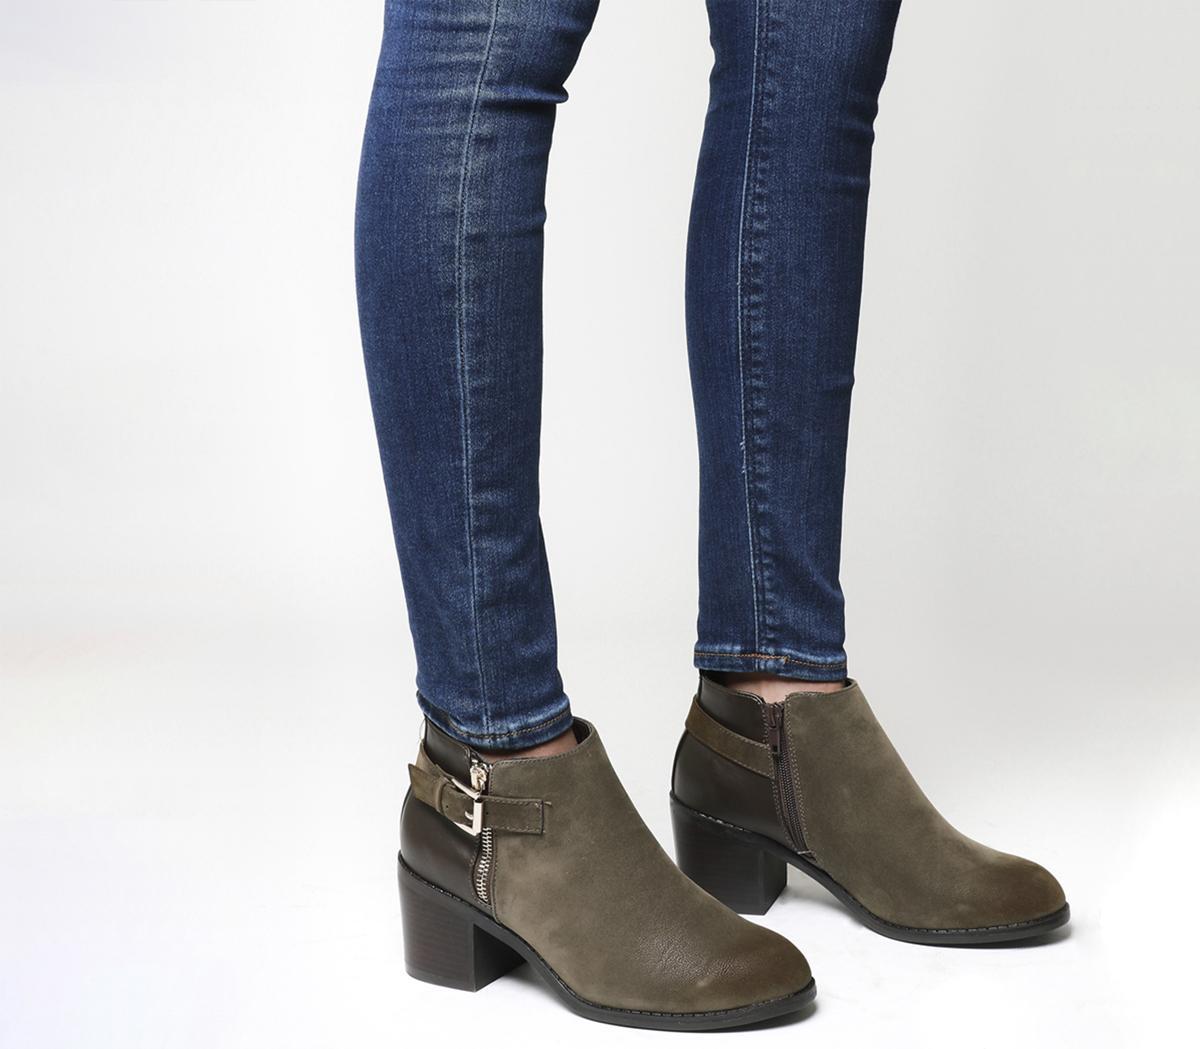 Academy Double Zip Boots